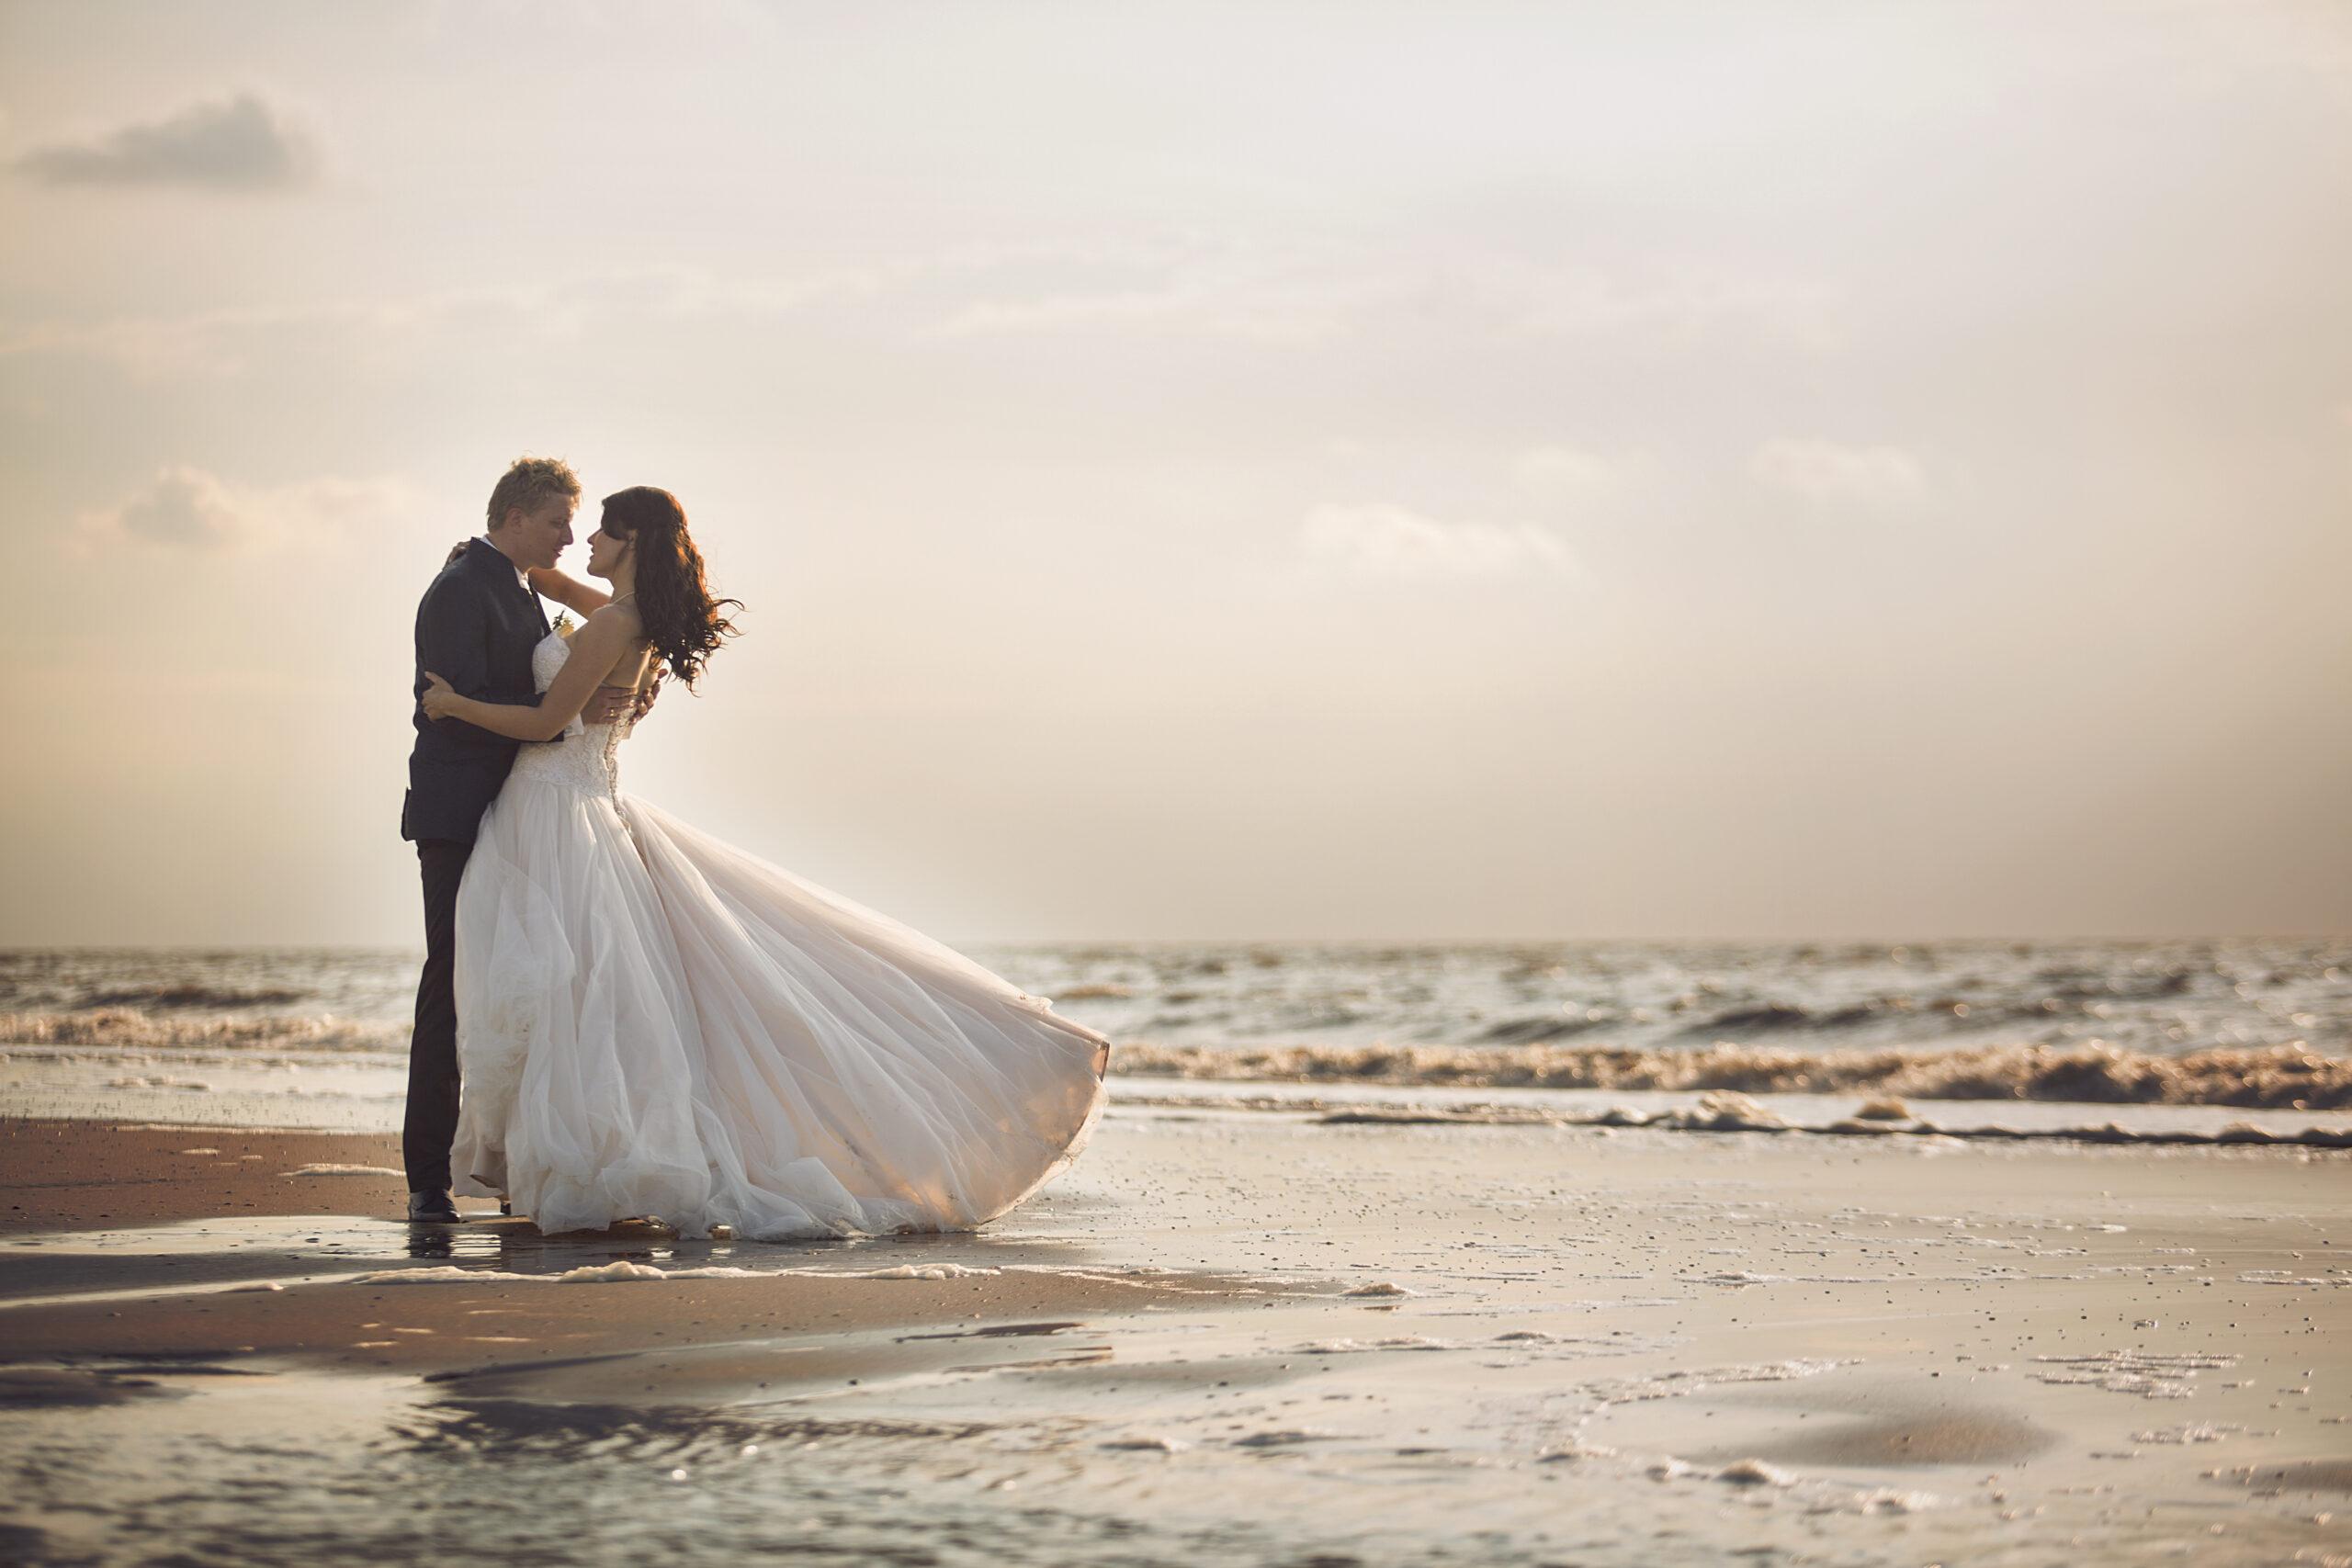 MVDL_WEDDING_3